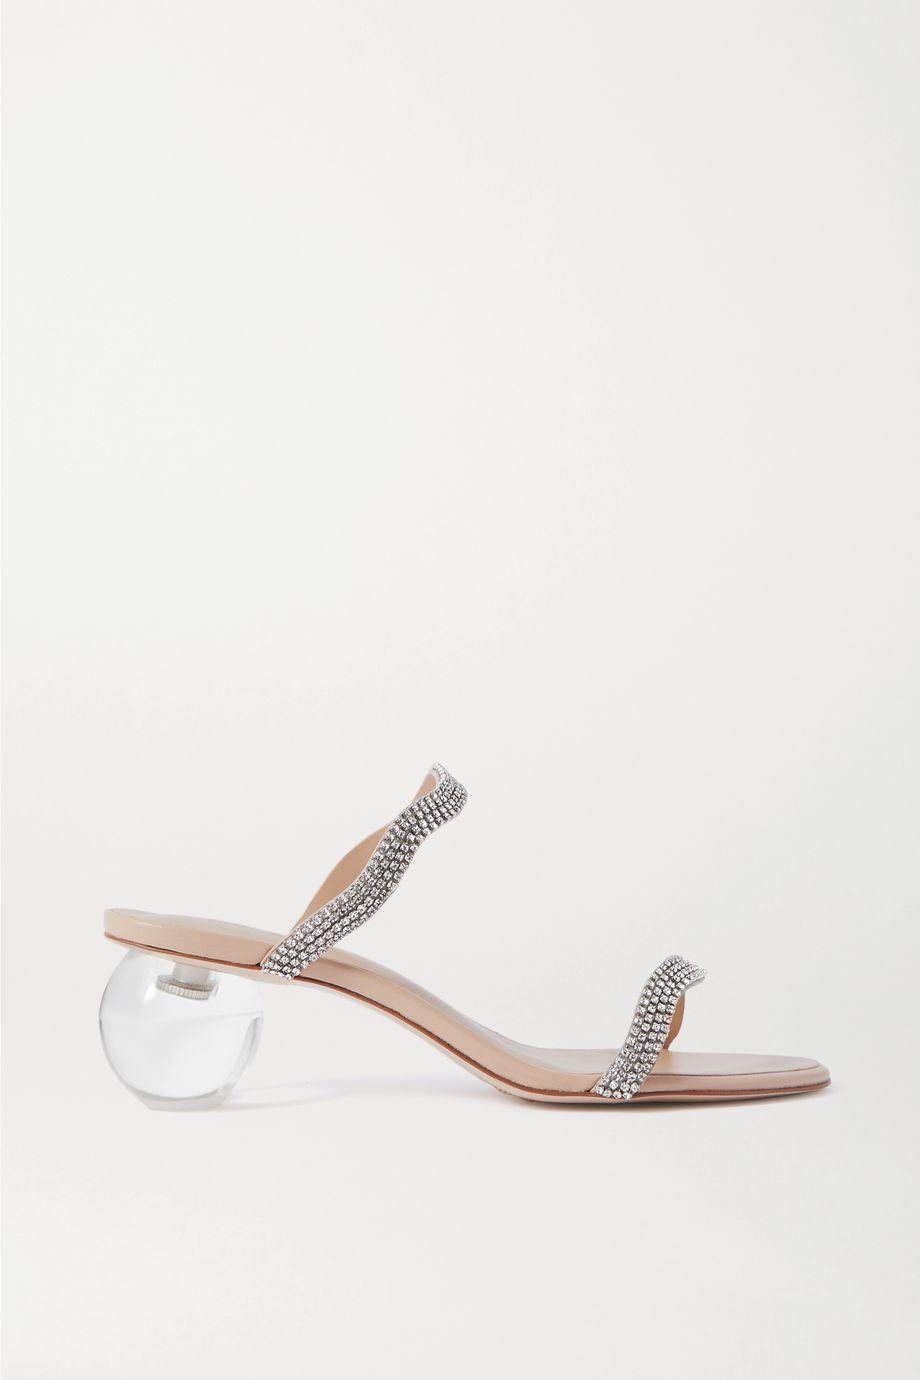 Cult Gaia Audrey 水晶缀饰皮革穆勒鞋